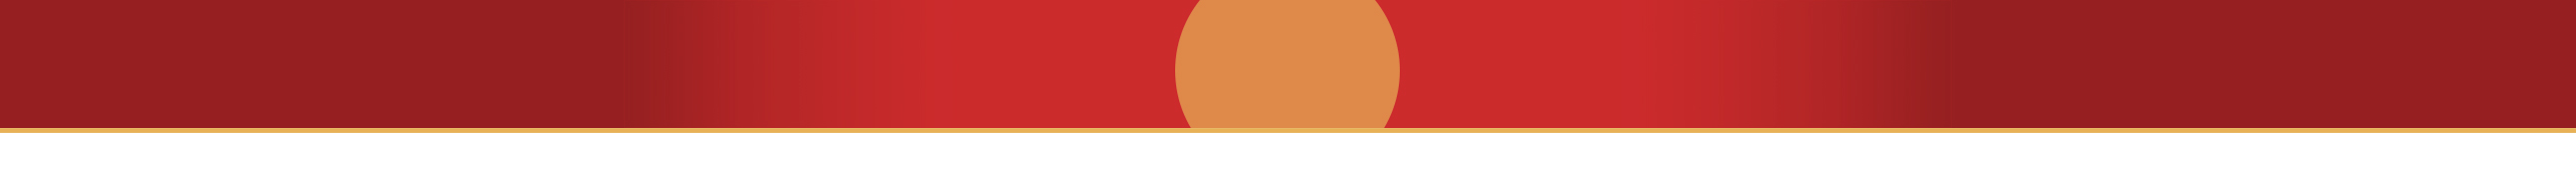 Senilife_Content-Sliders-Background